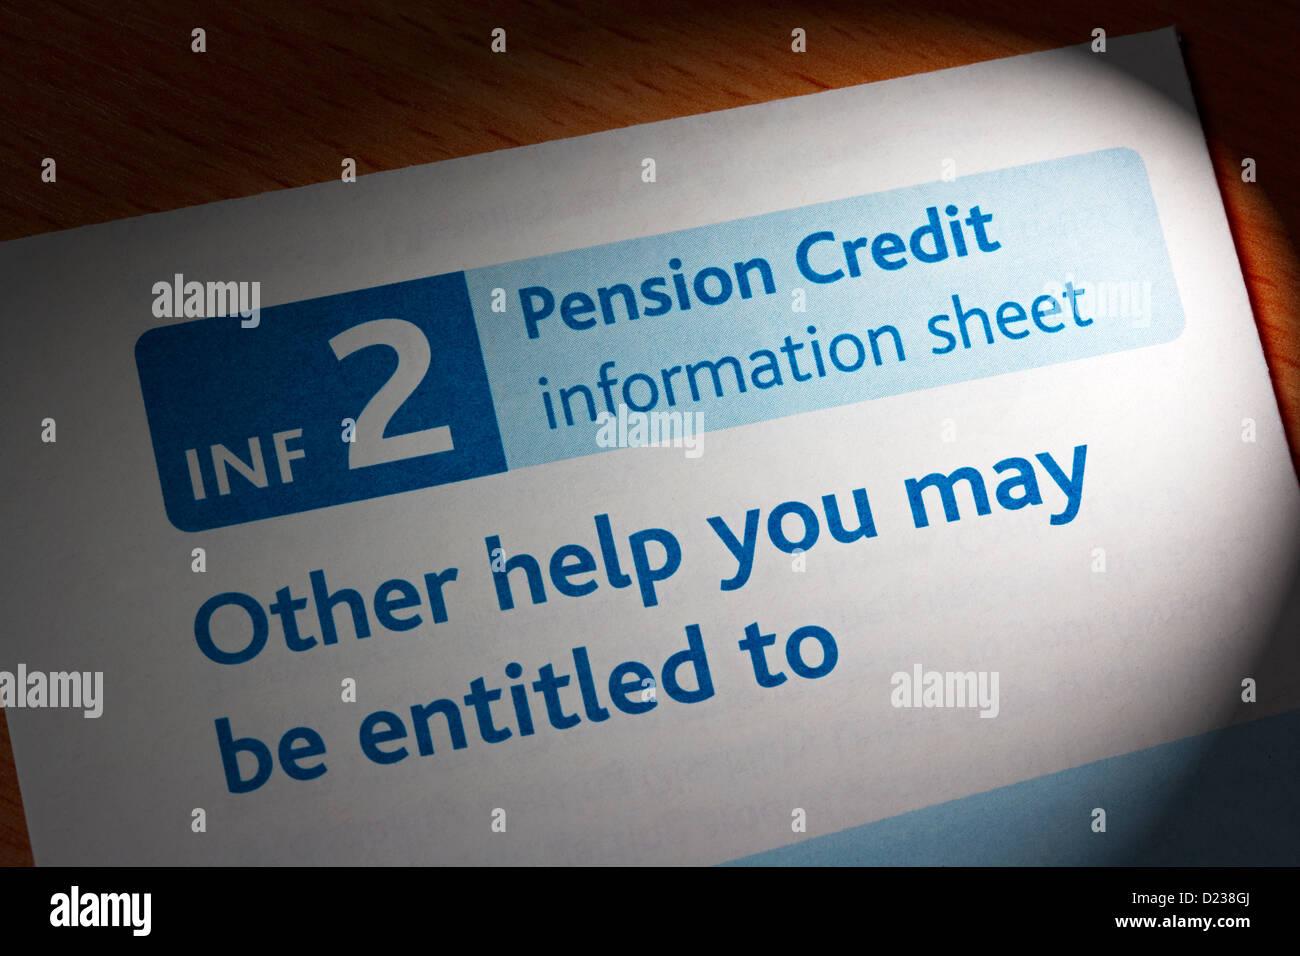 Pension Credit information sheet - Stock Image